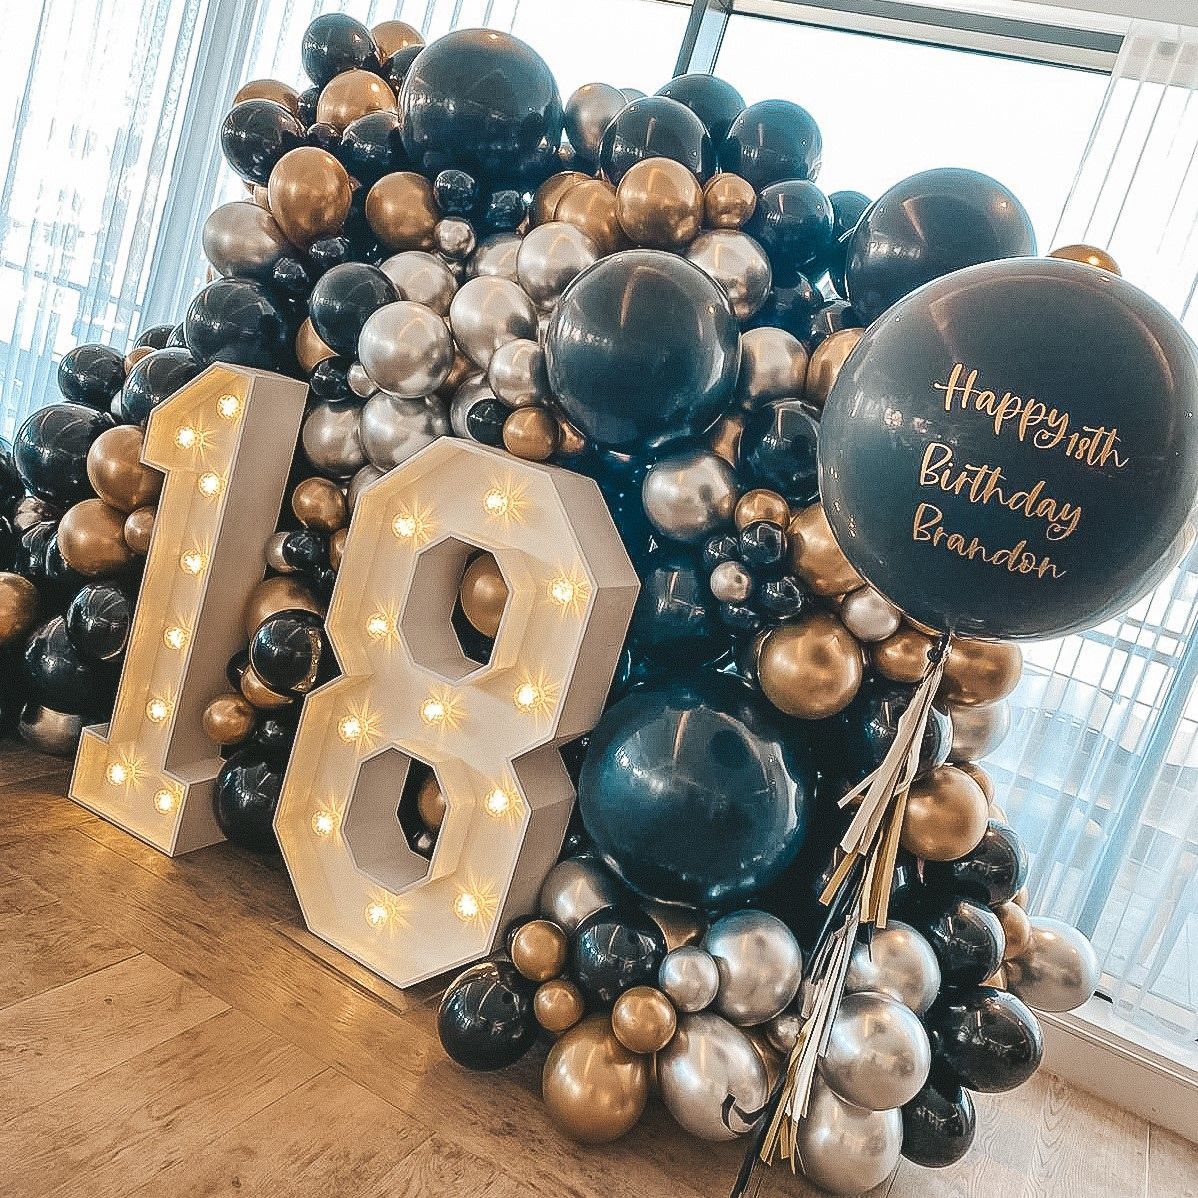 18th Birthday Balloon Wall 18th Birthday Decorations 18 Birthday Party Decorations Birthday Balloon Decorations